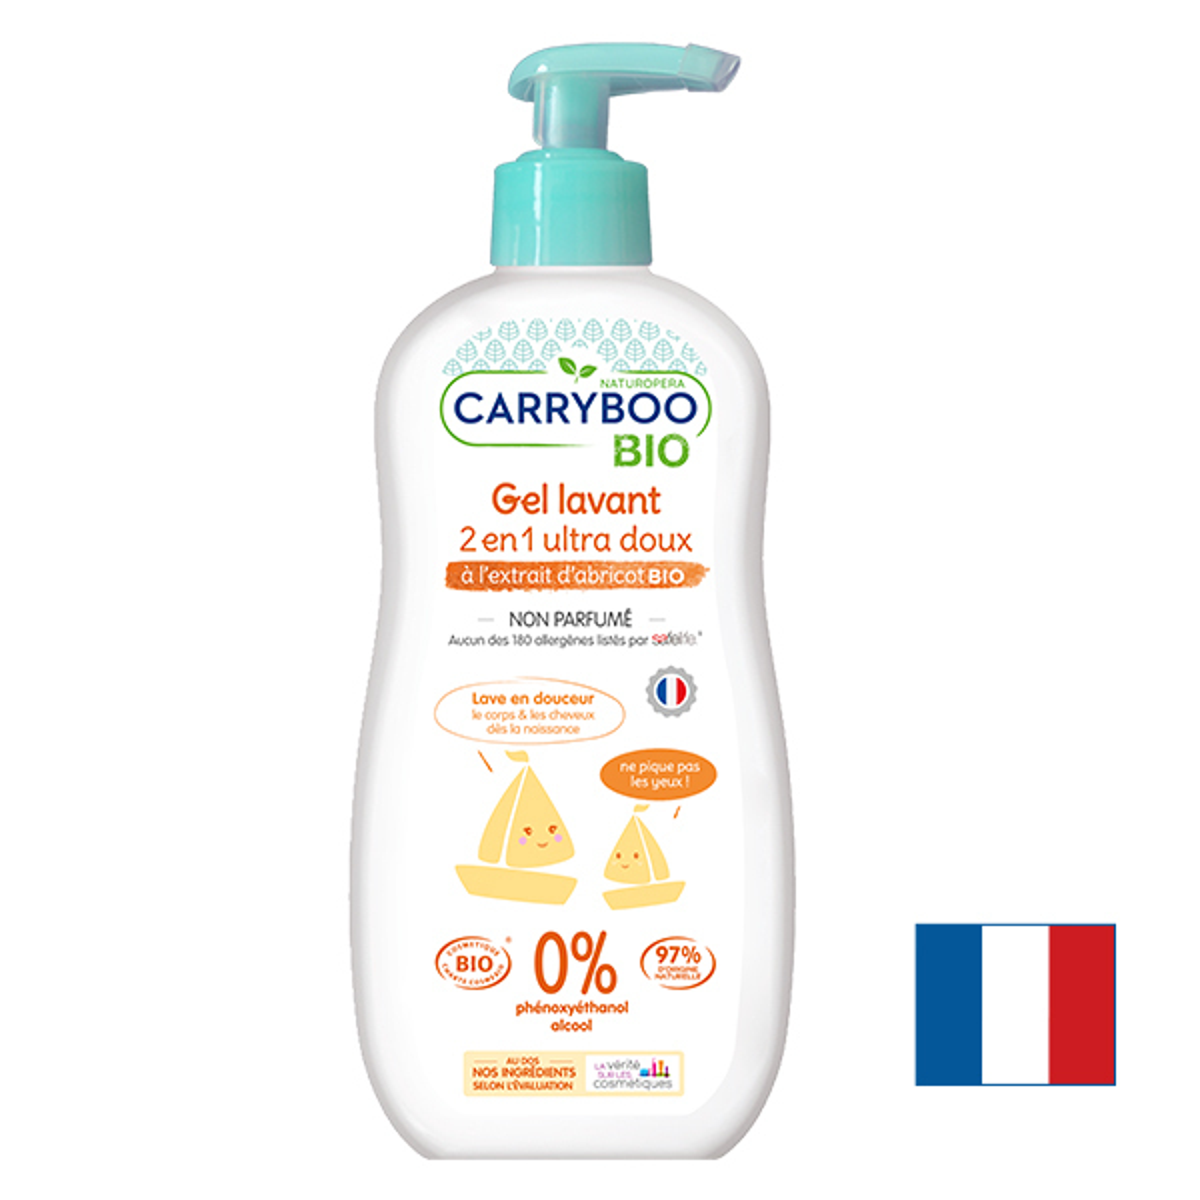 Carryboo - Gel Lavant 2en1 BIO (500ml) Ultra Doux Sans Parfum